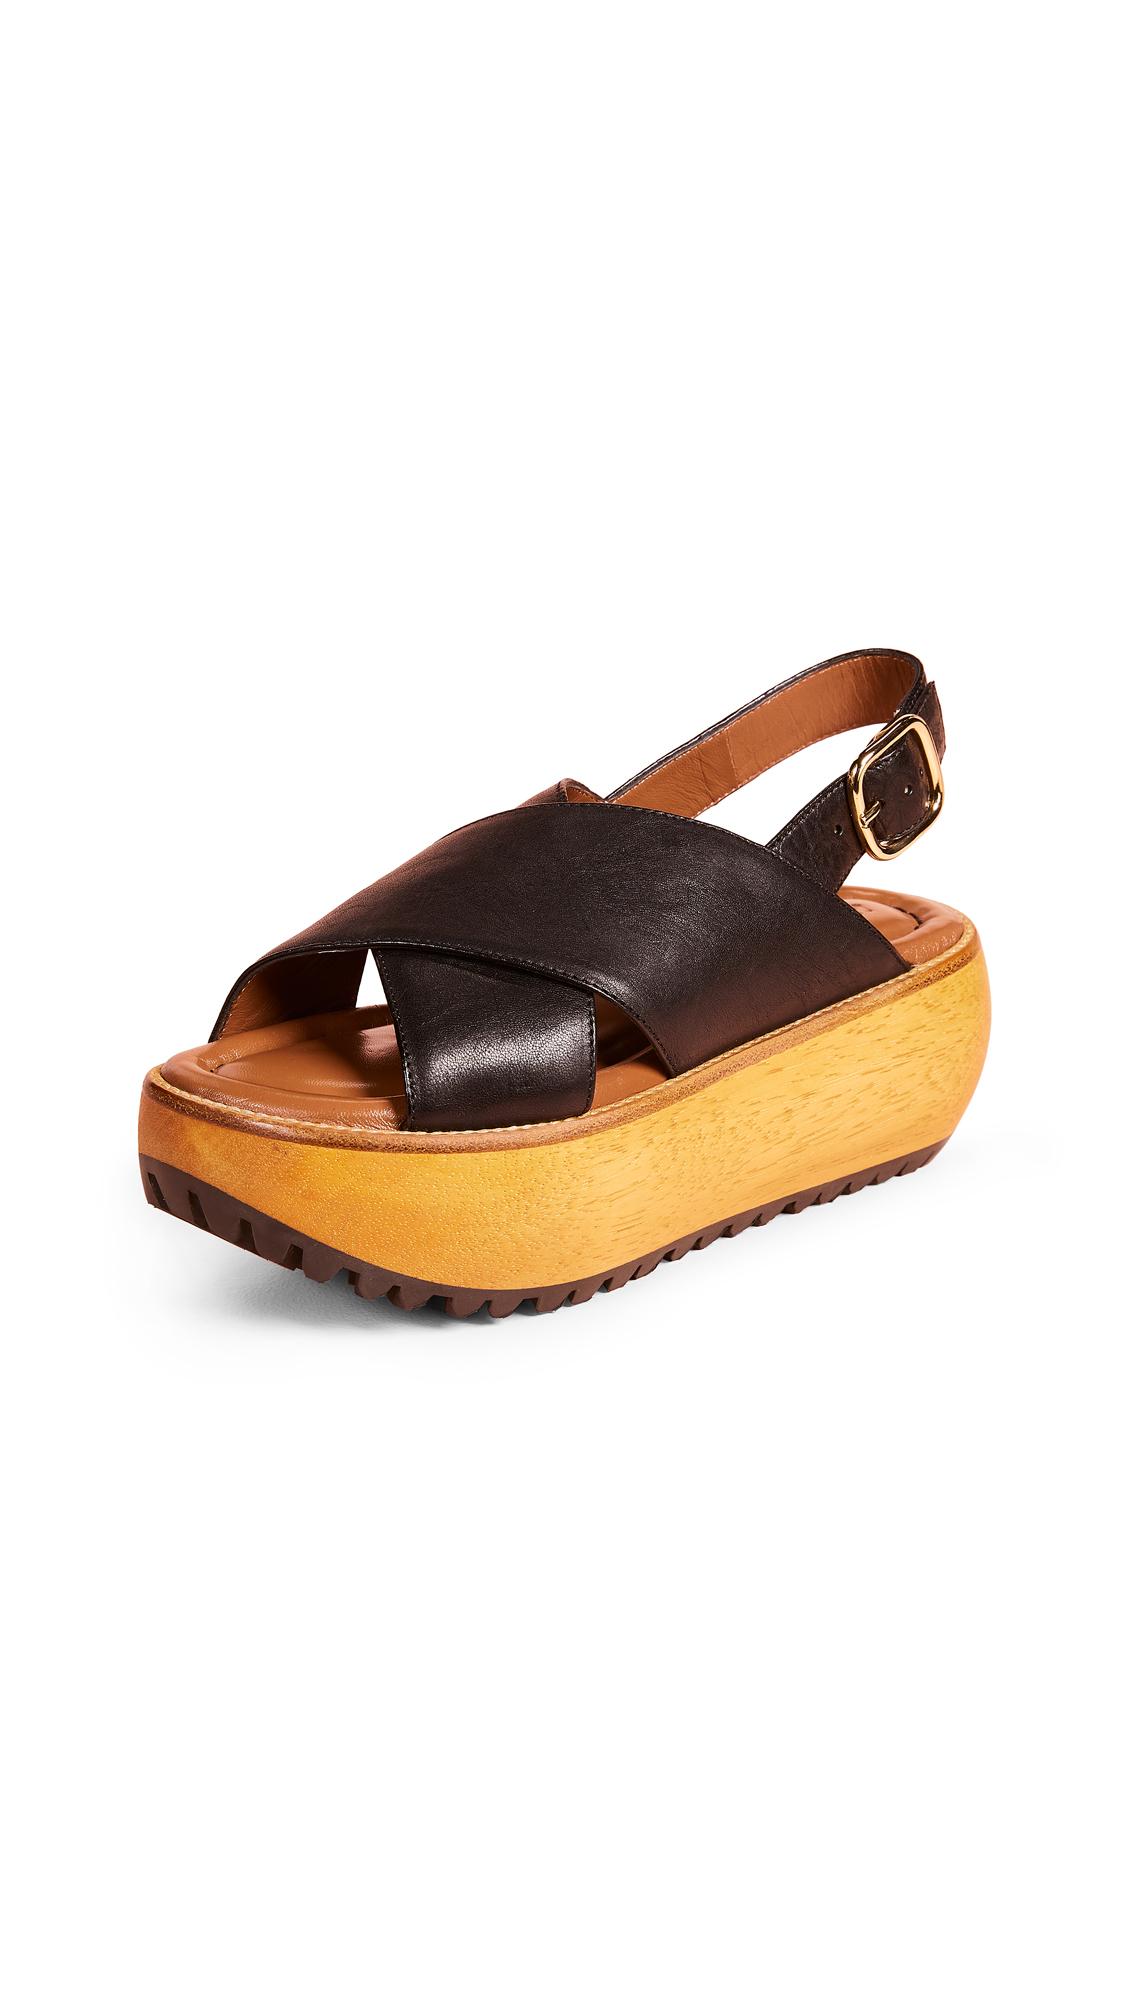 Marni Platform Sandals - Black